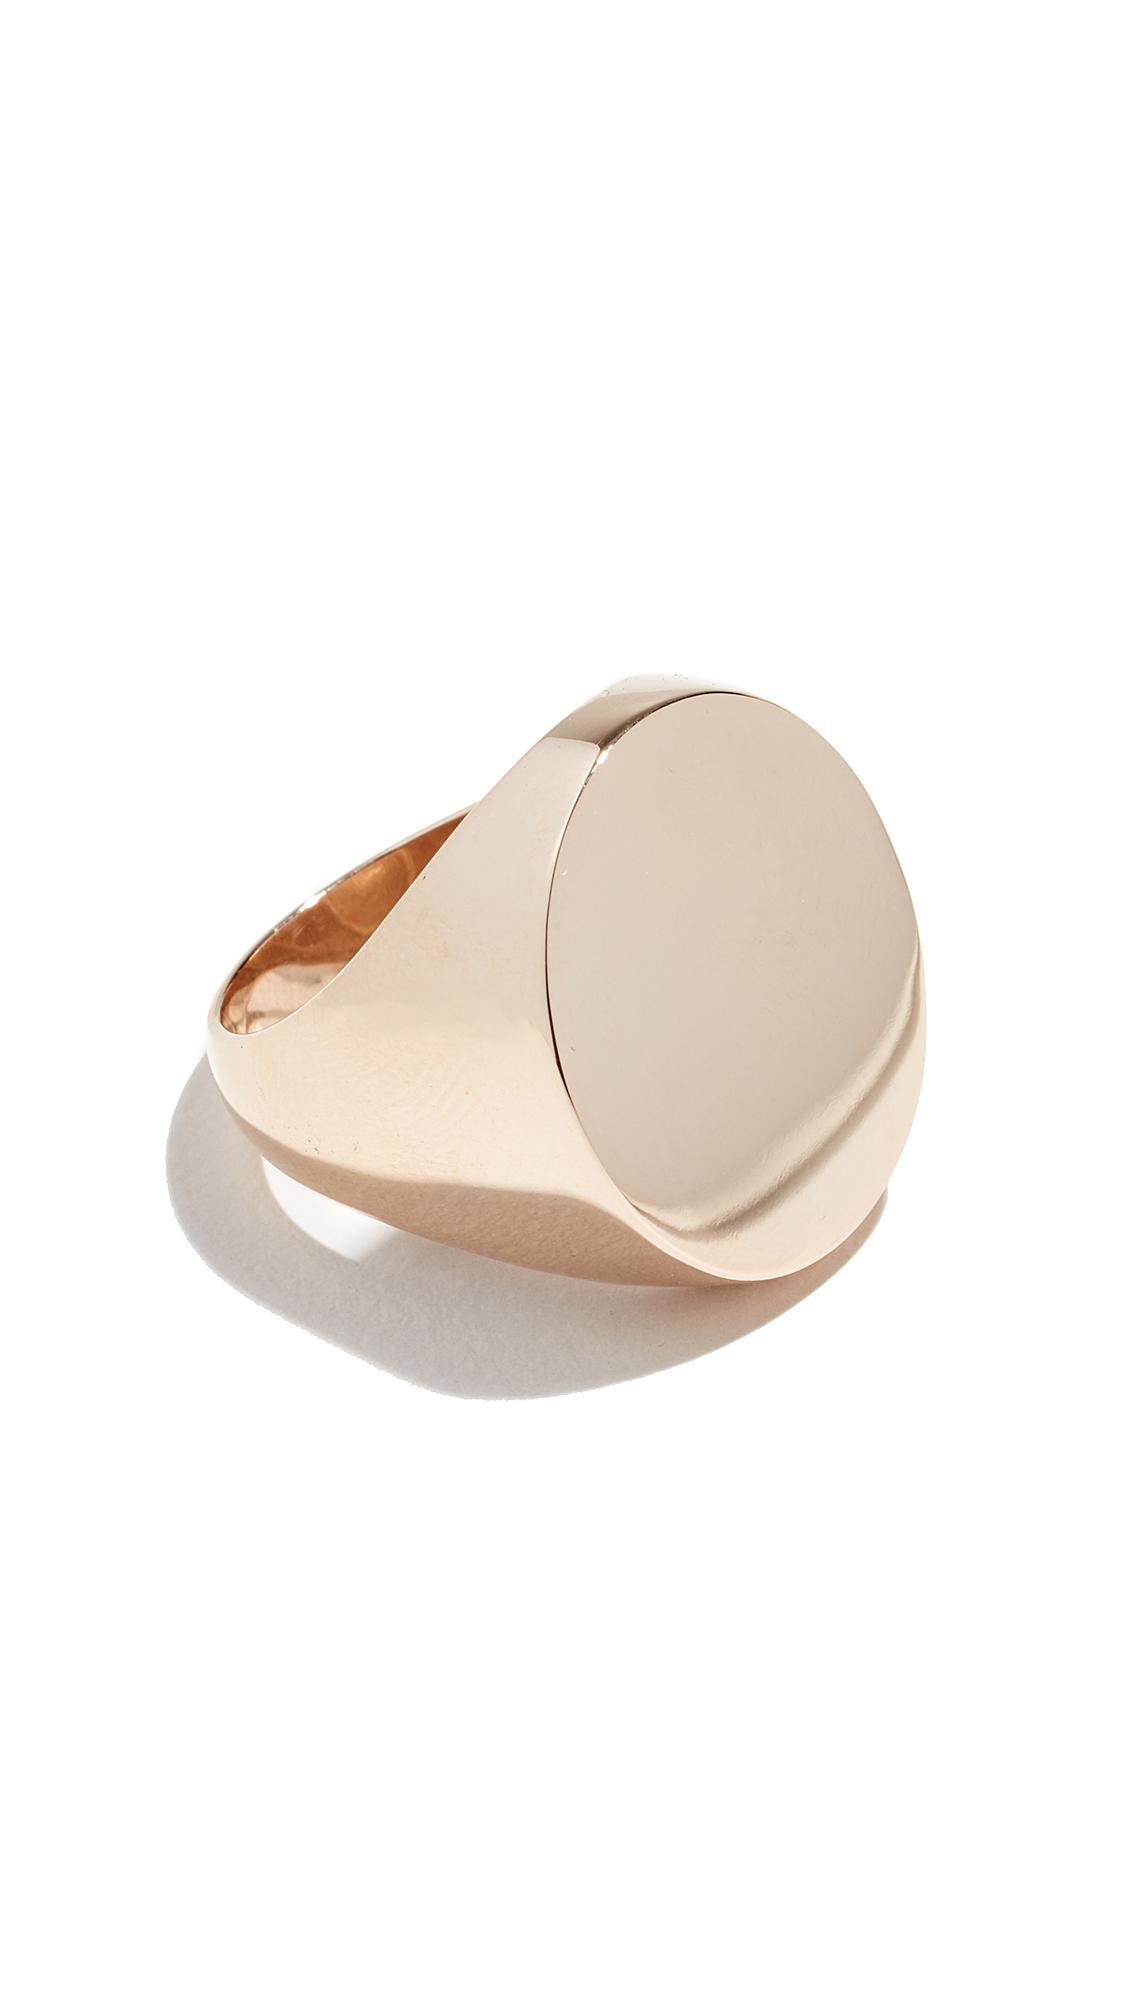 ARIEL GORDON JEWELRY 14K Royal Signet Ring in Yellow Gold